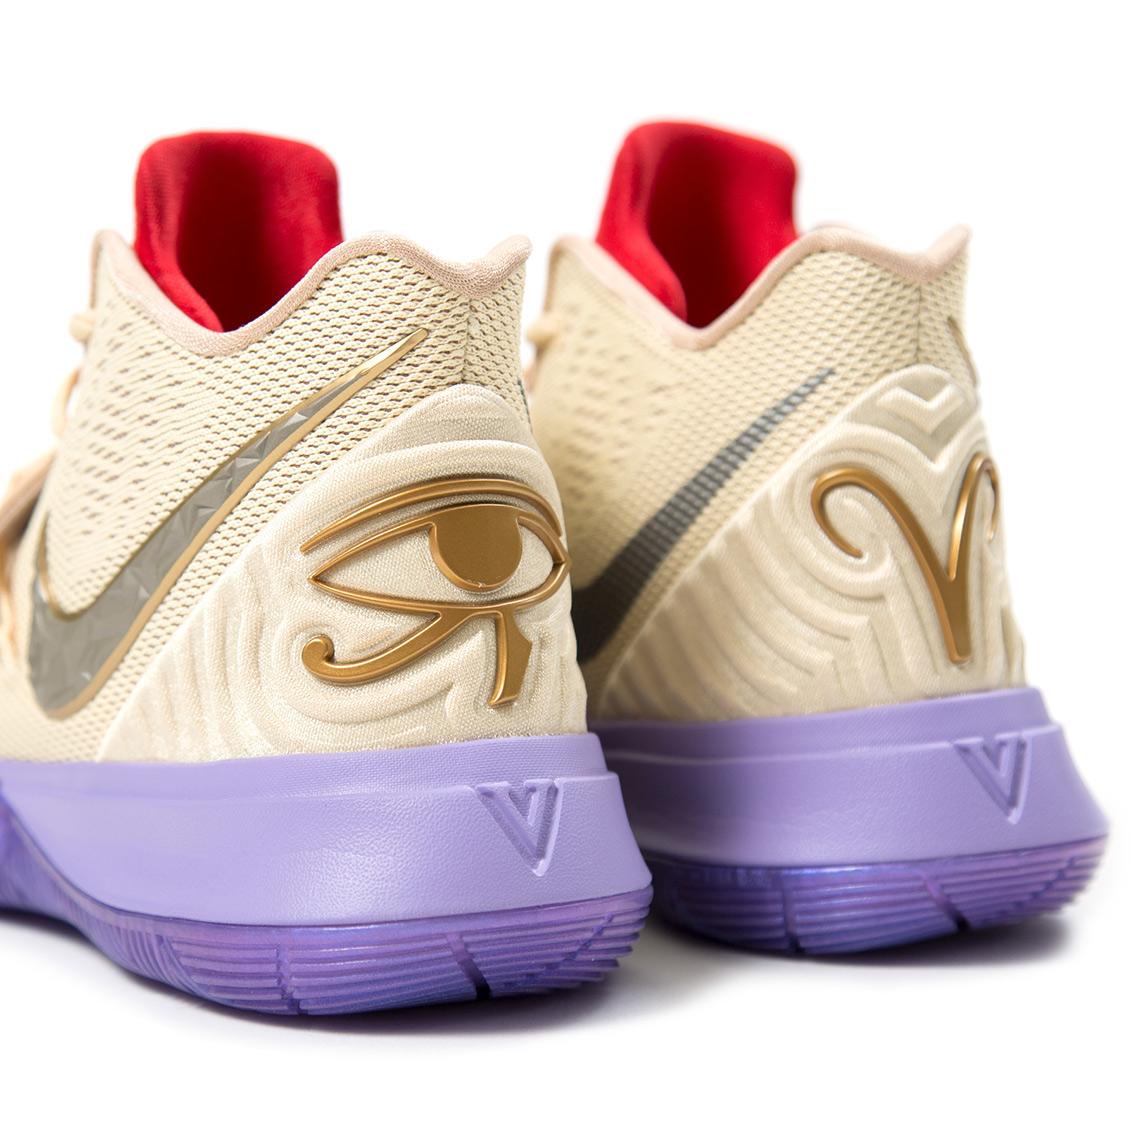 7ffe67b55a44 Concepts Nike Kyrie 5 Ikhet